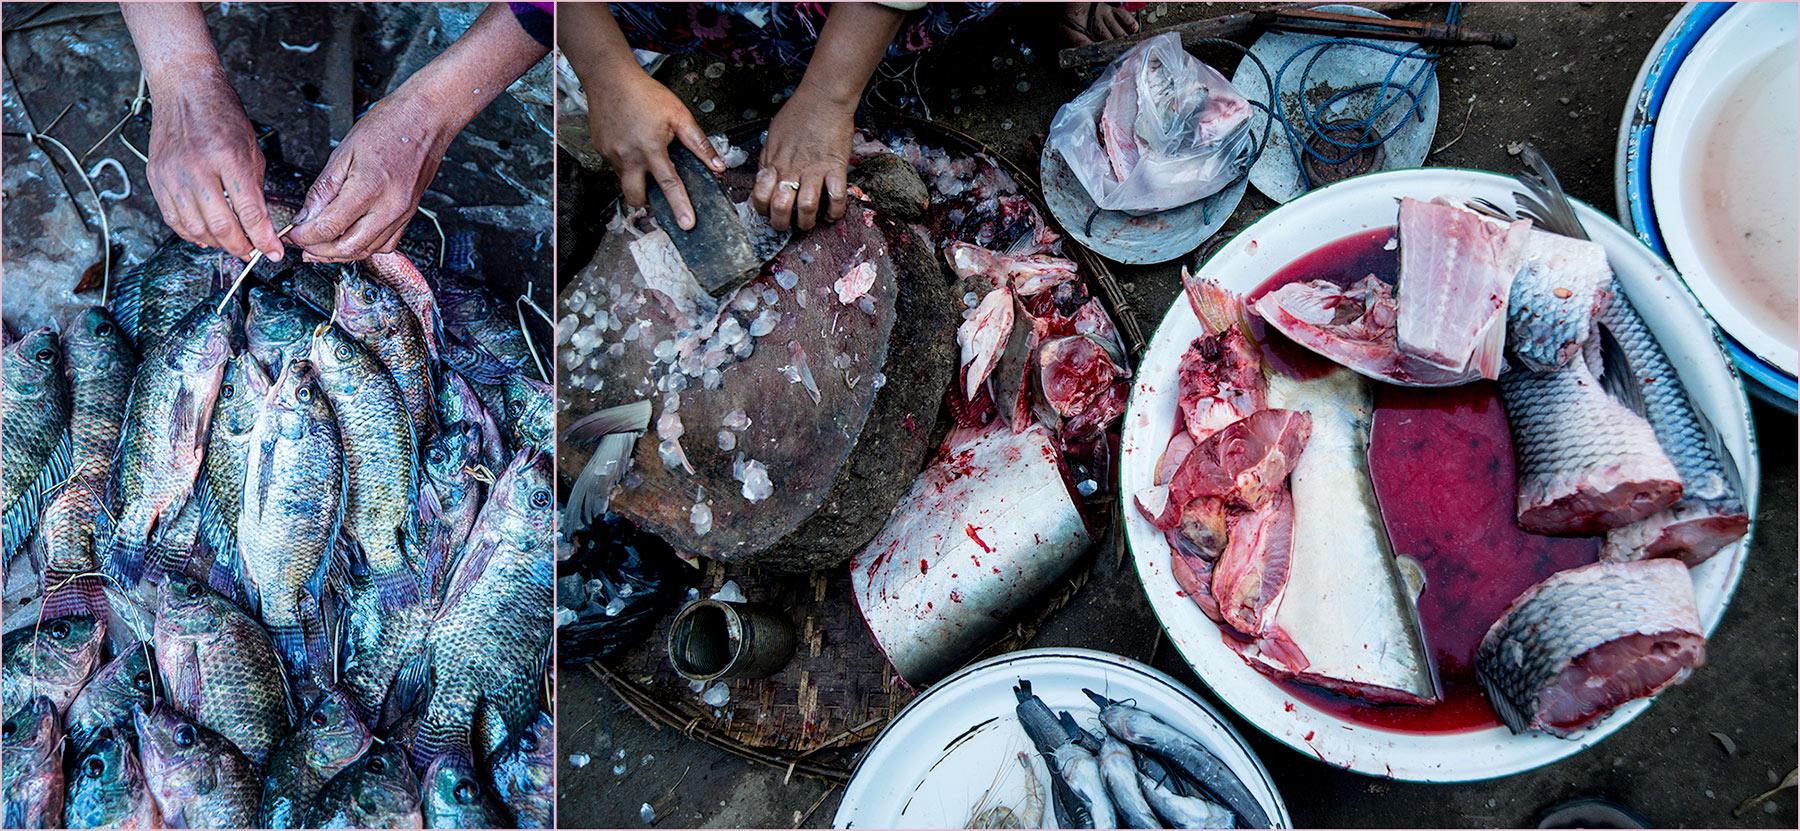 Myanmar: Fish market